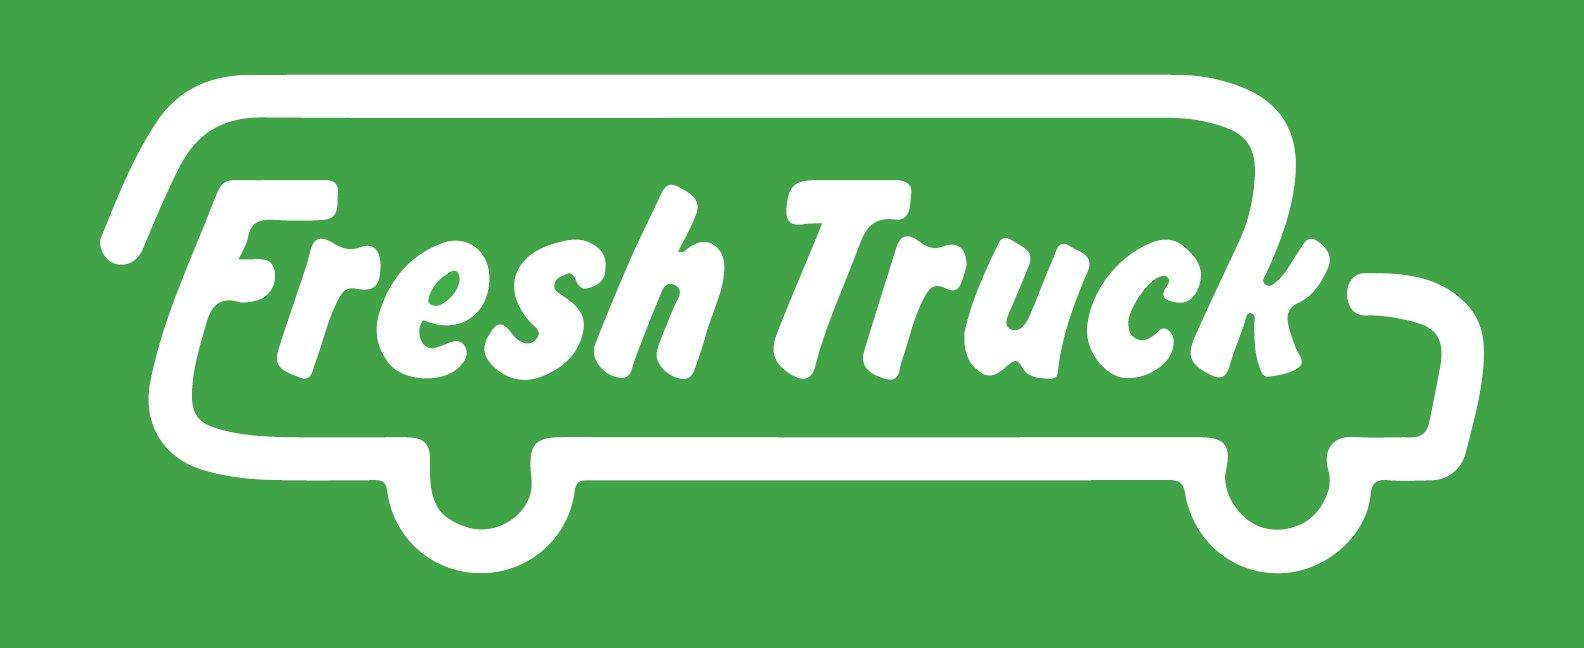 The Fresh Truck logo